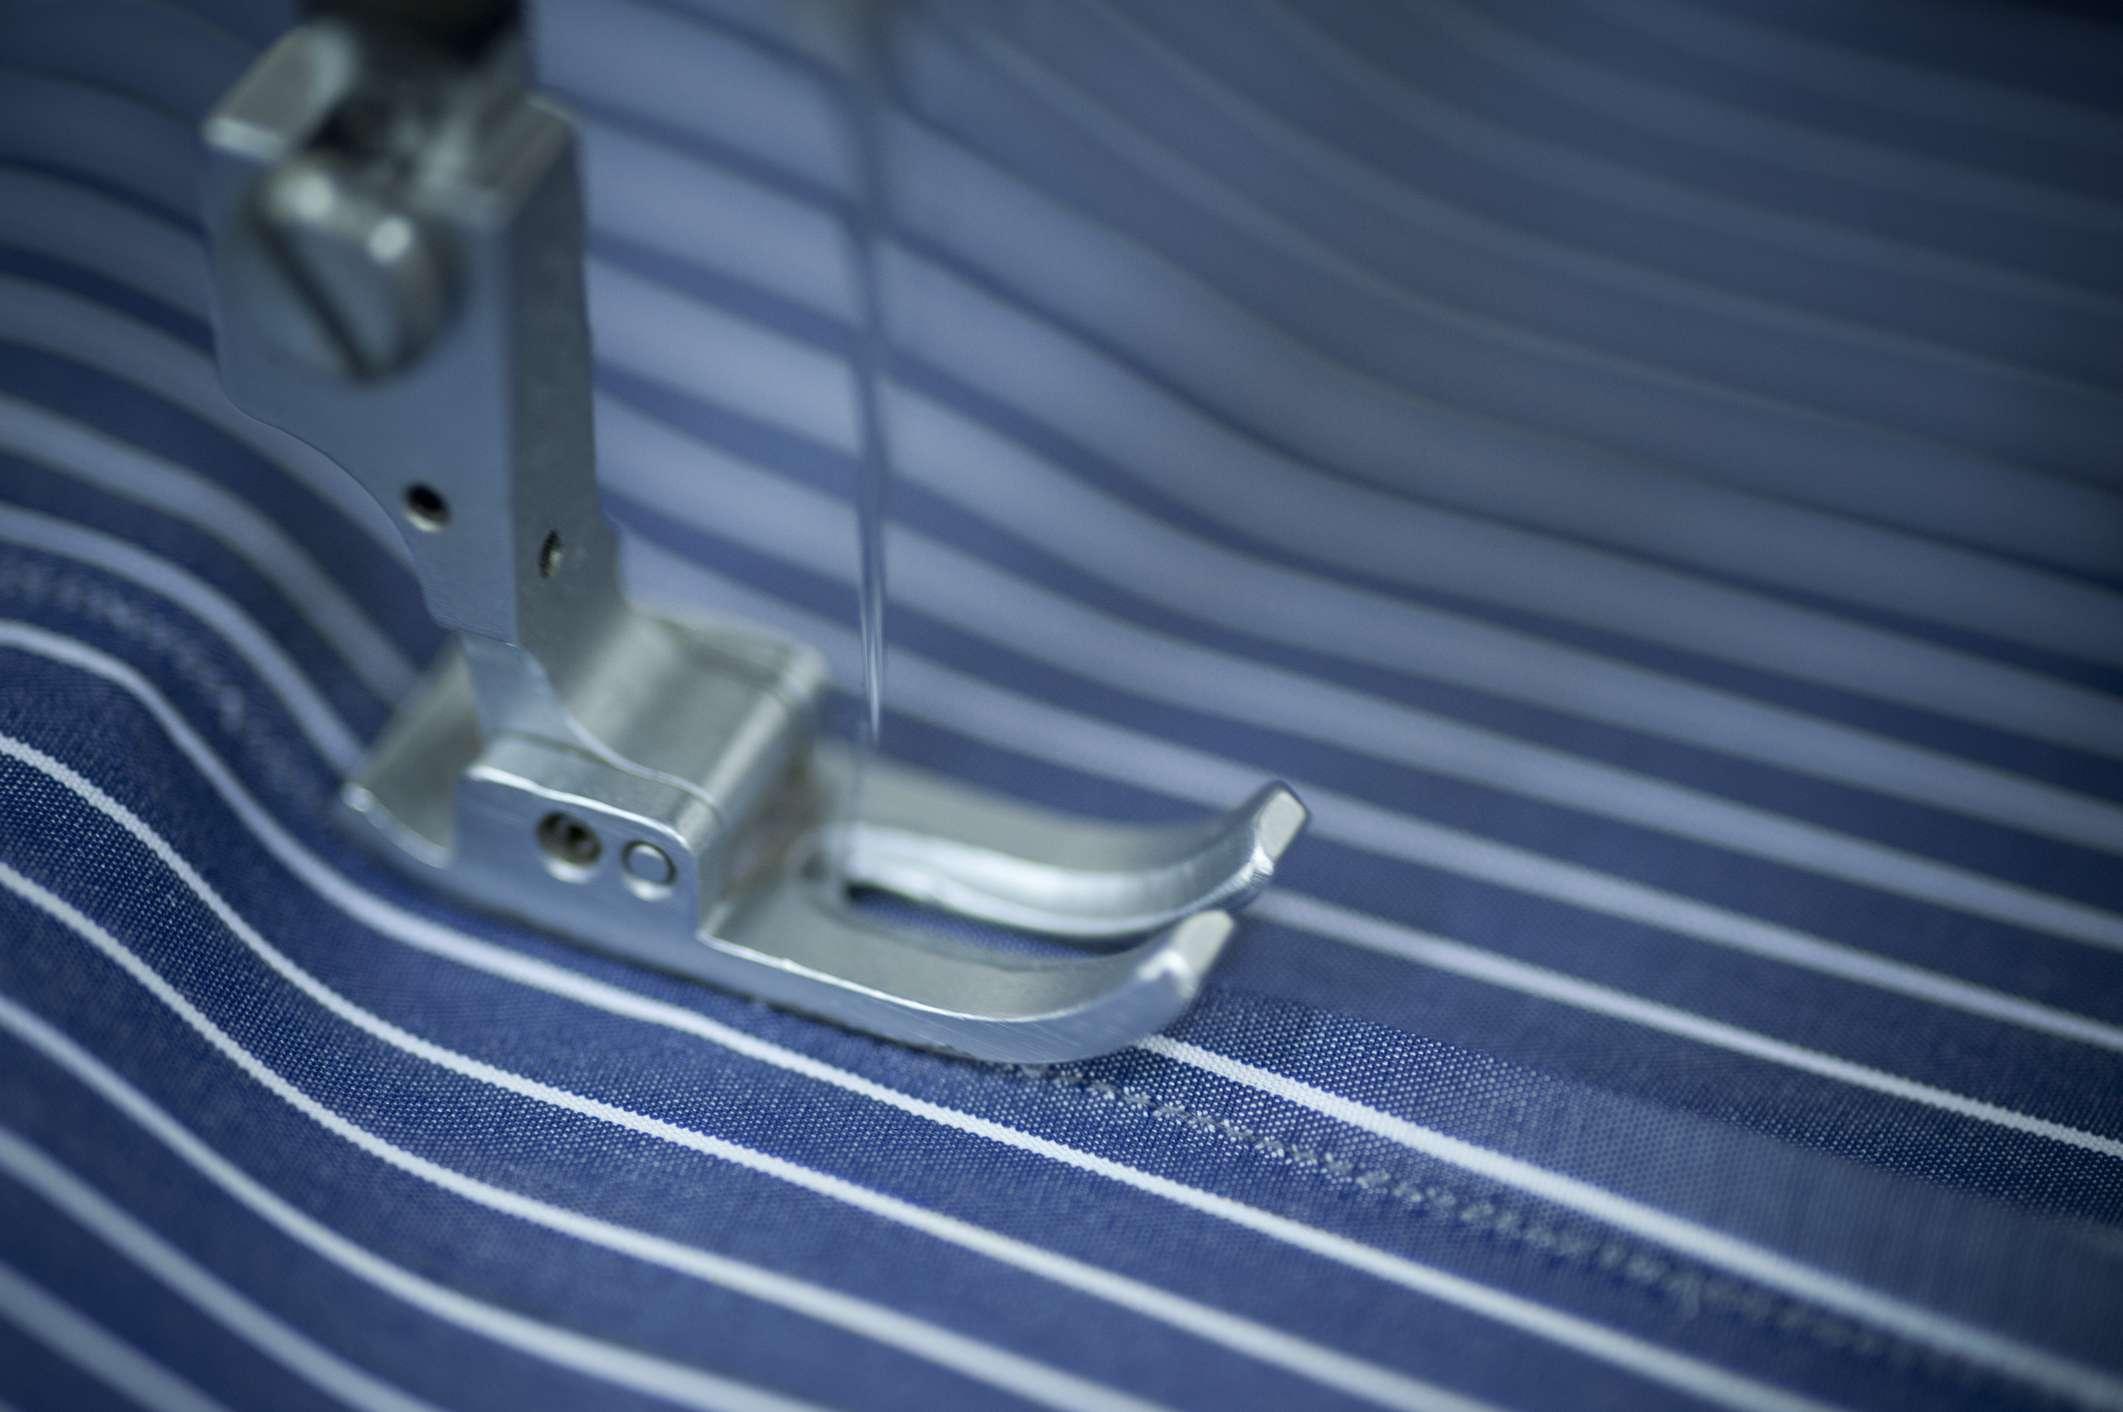 Sewing seam